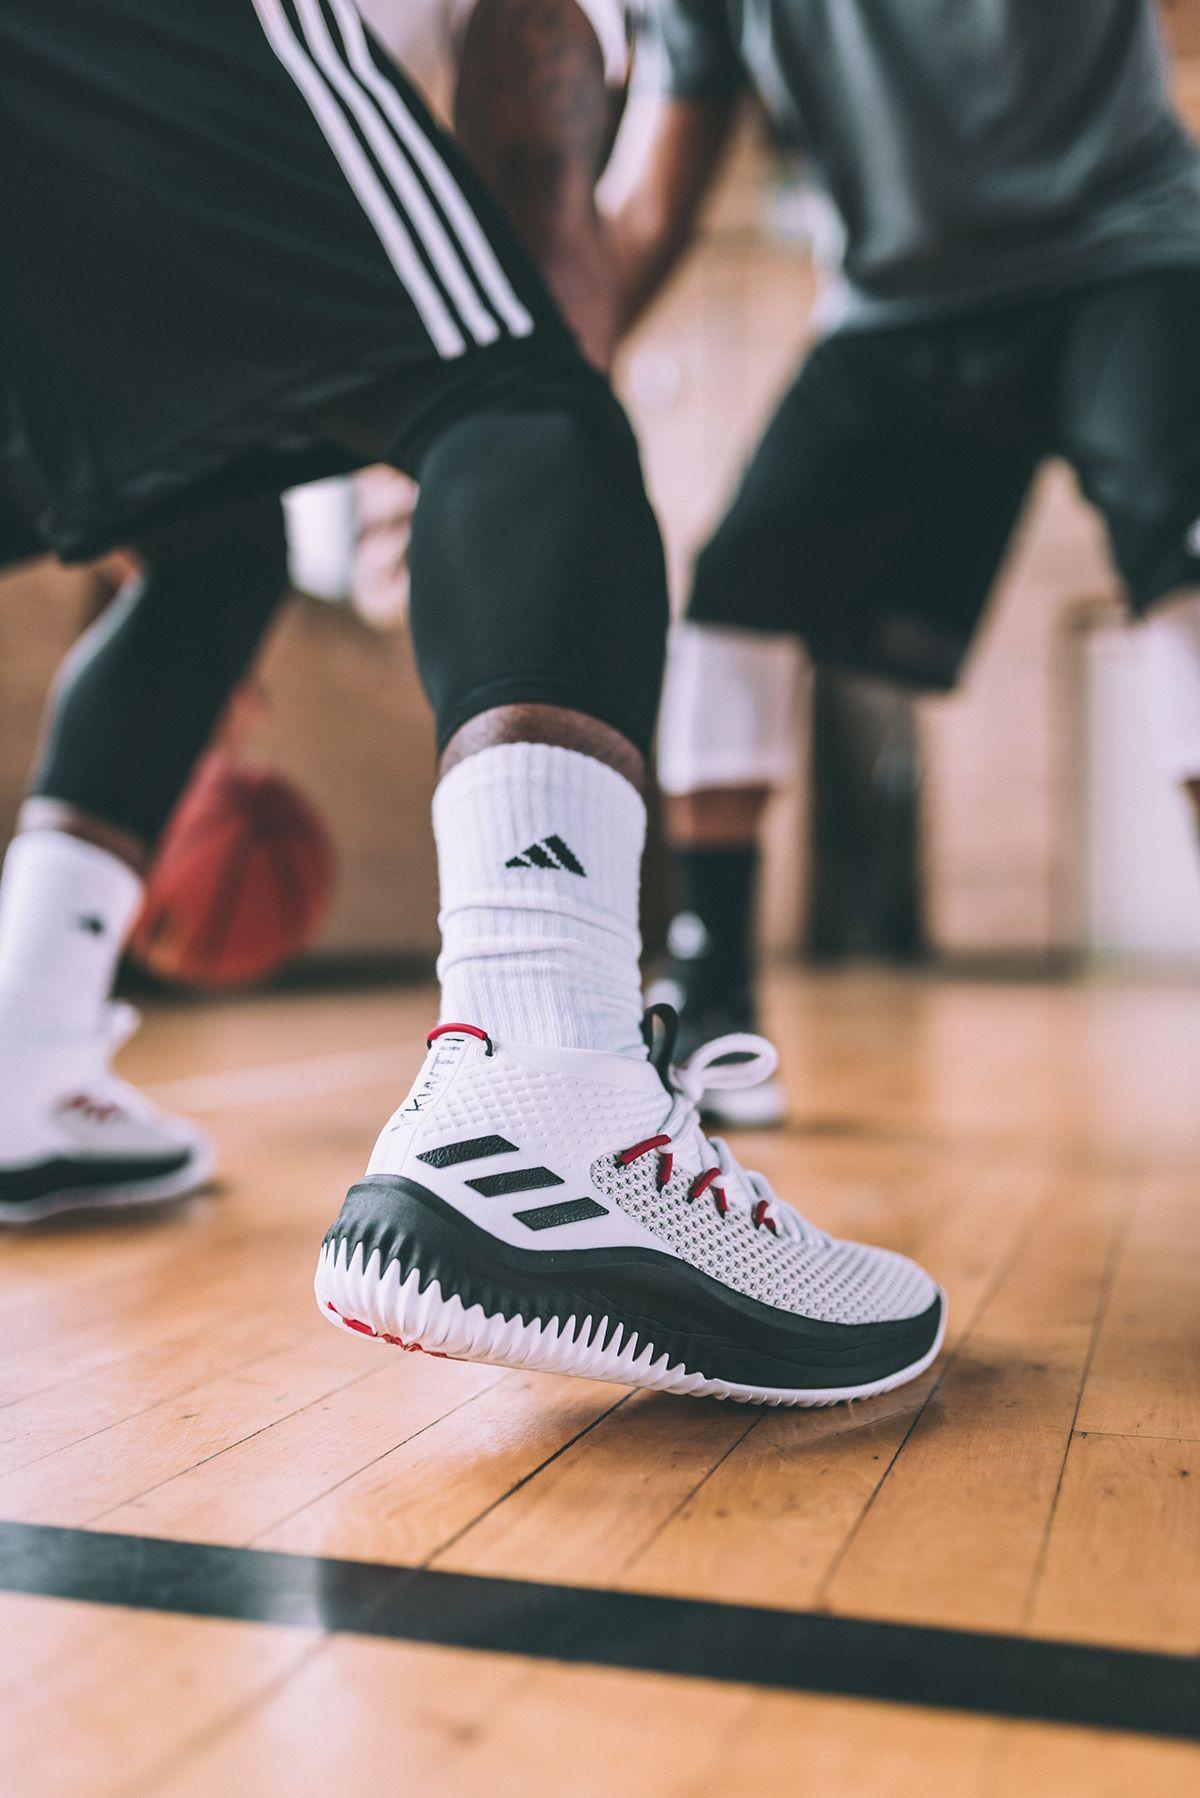 Adidas Basketball Damian Lillard Dame 4 Adidas Dame Adidas Adidas Sneakers